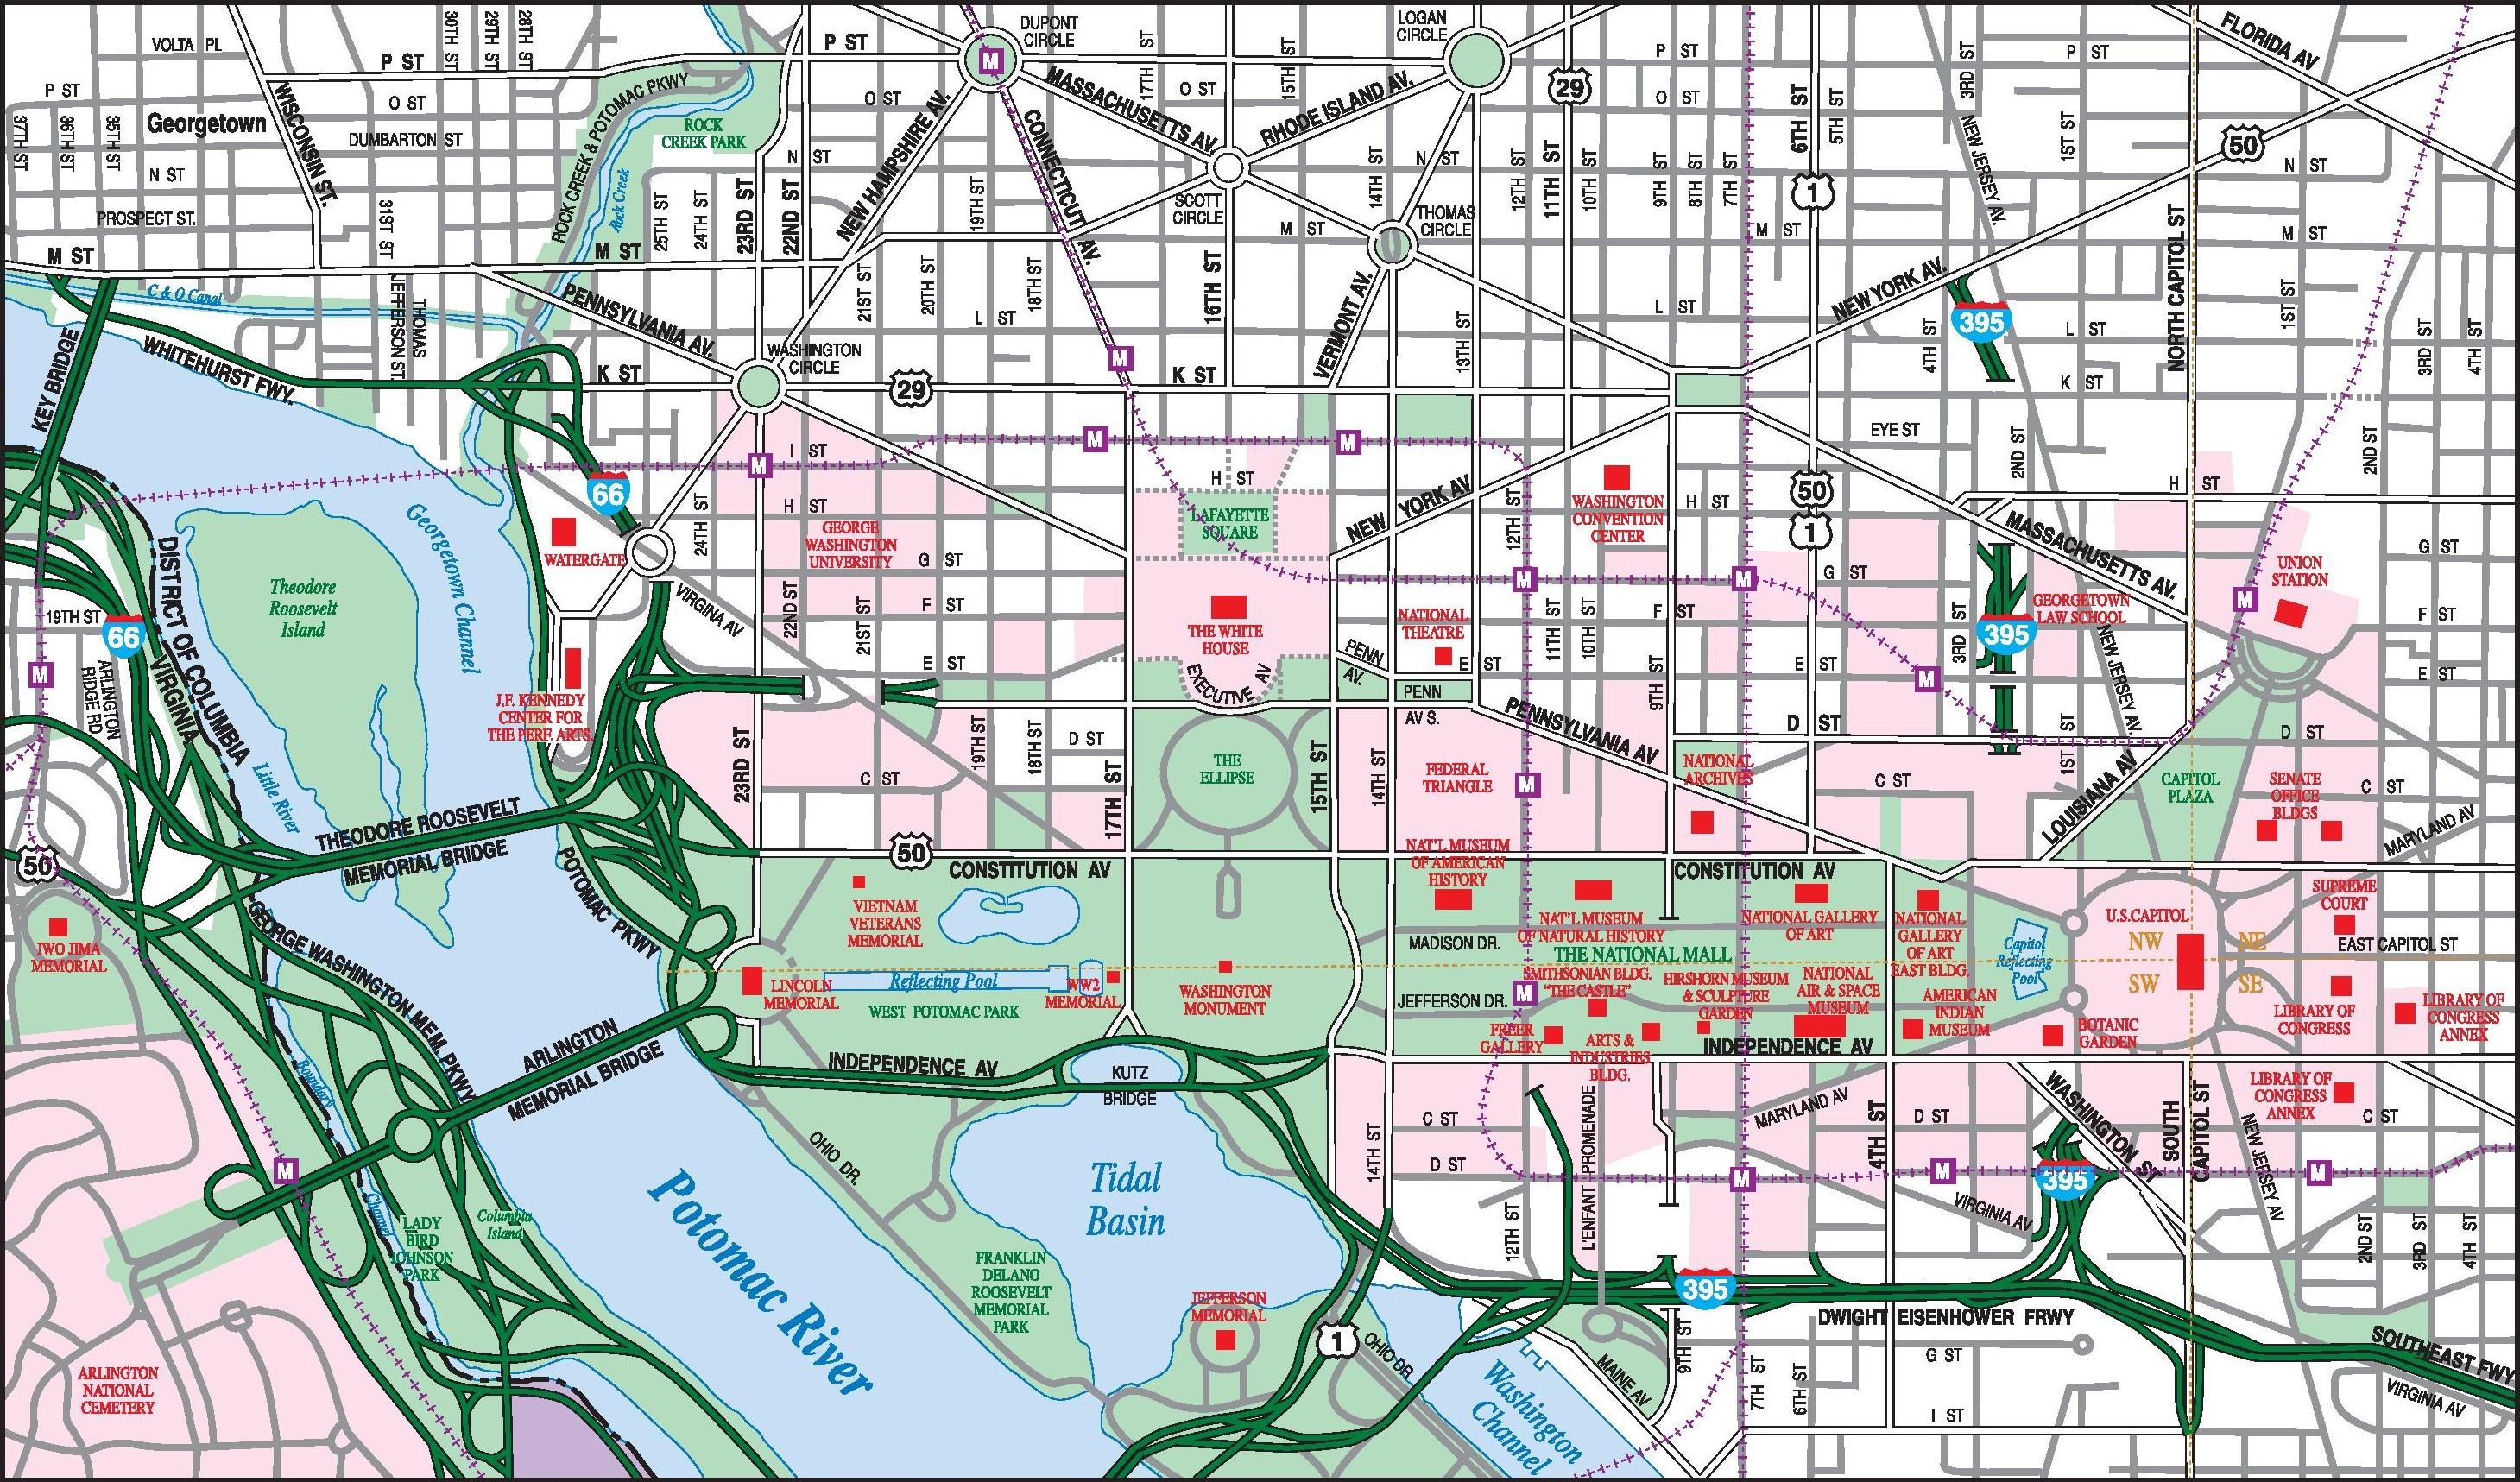 Washington, D.C. downtown map